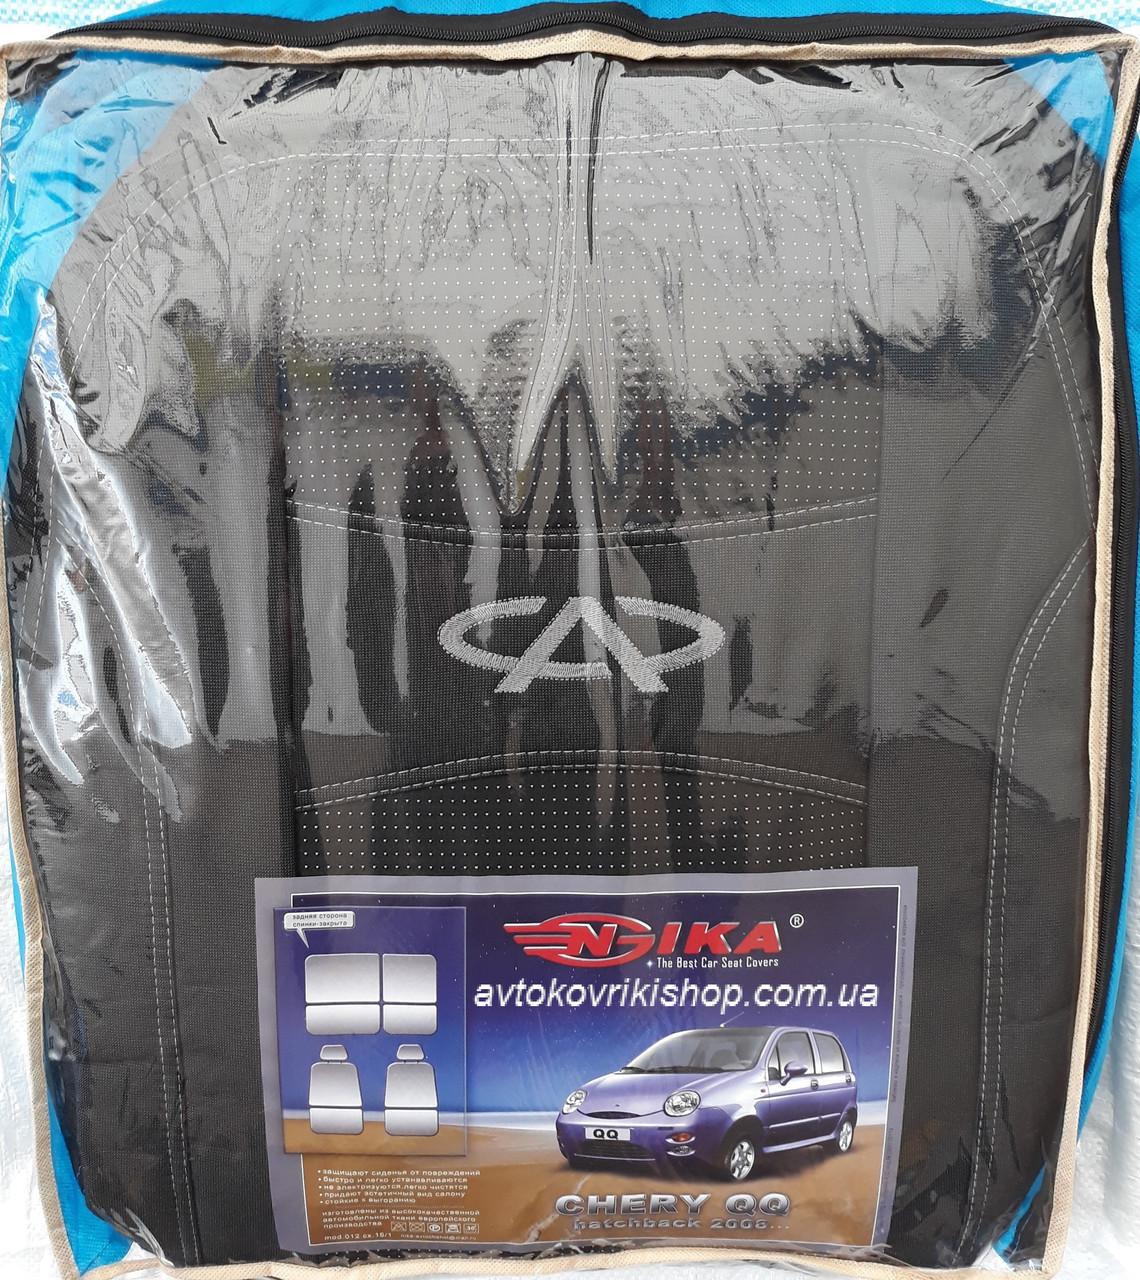 Авточехлы Chery QQ HB 2008- Nika